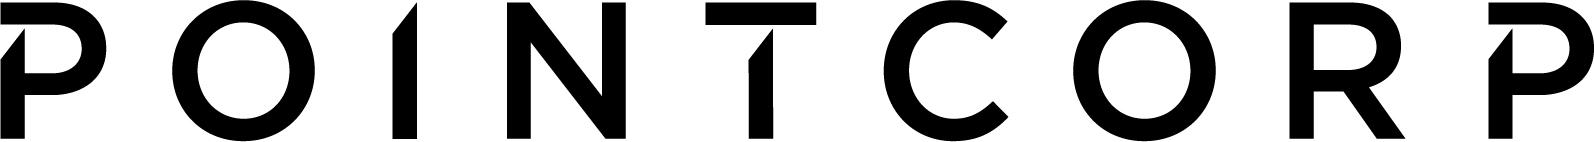 Client-Logos-Pointcorp_Black.jpg